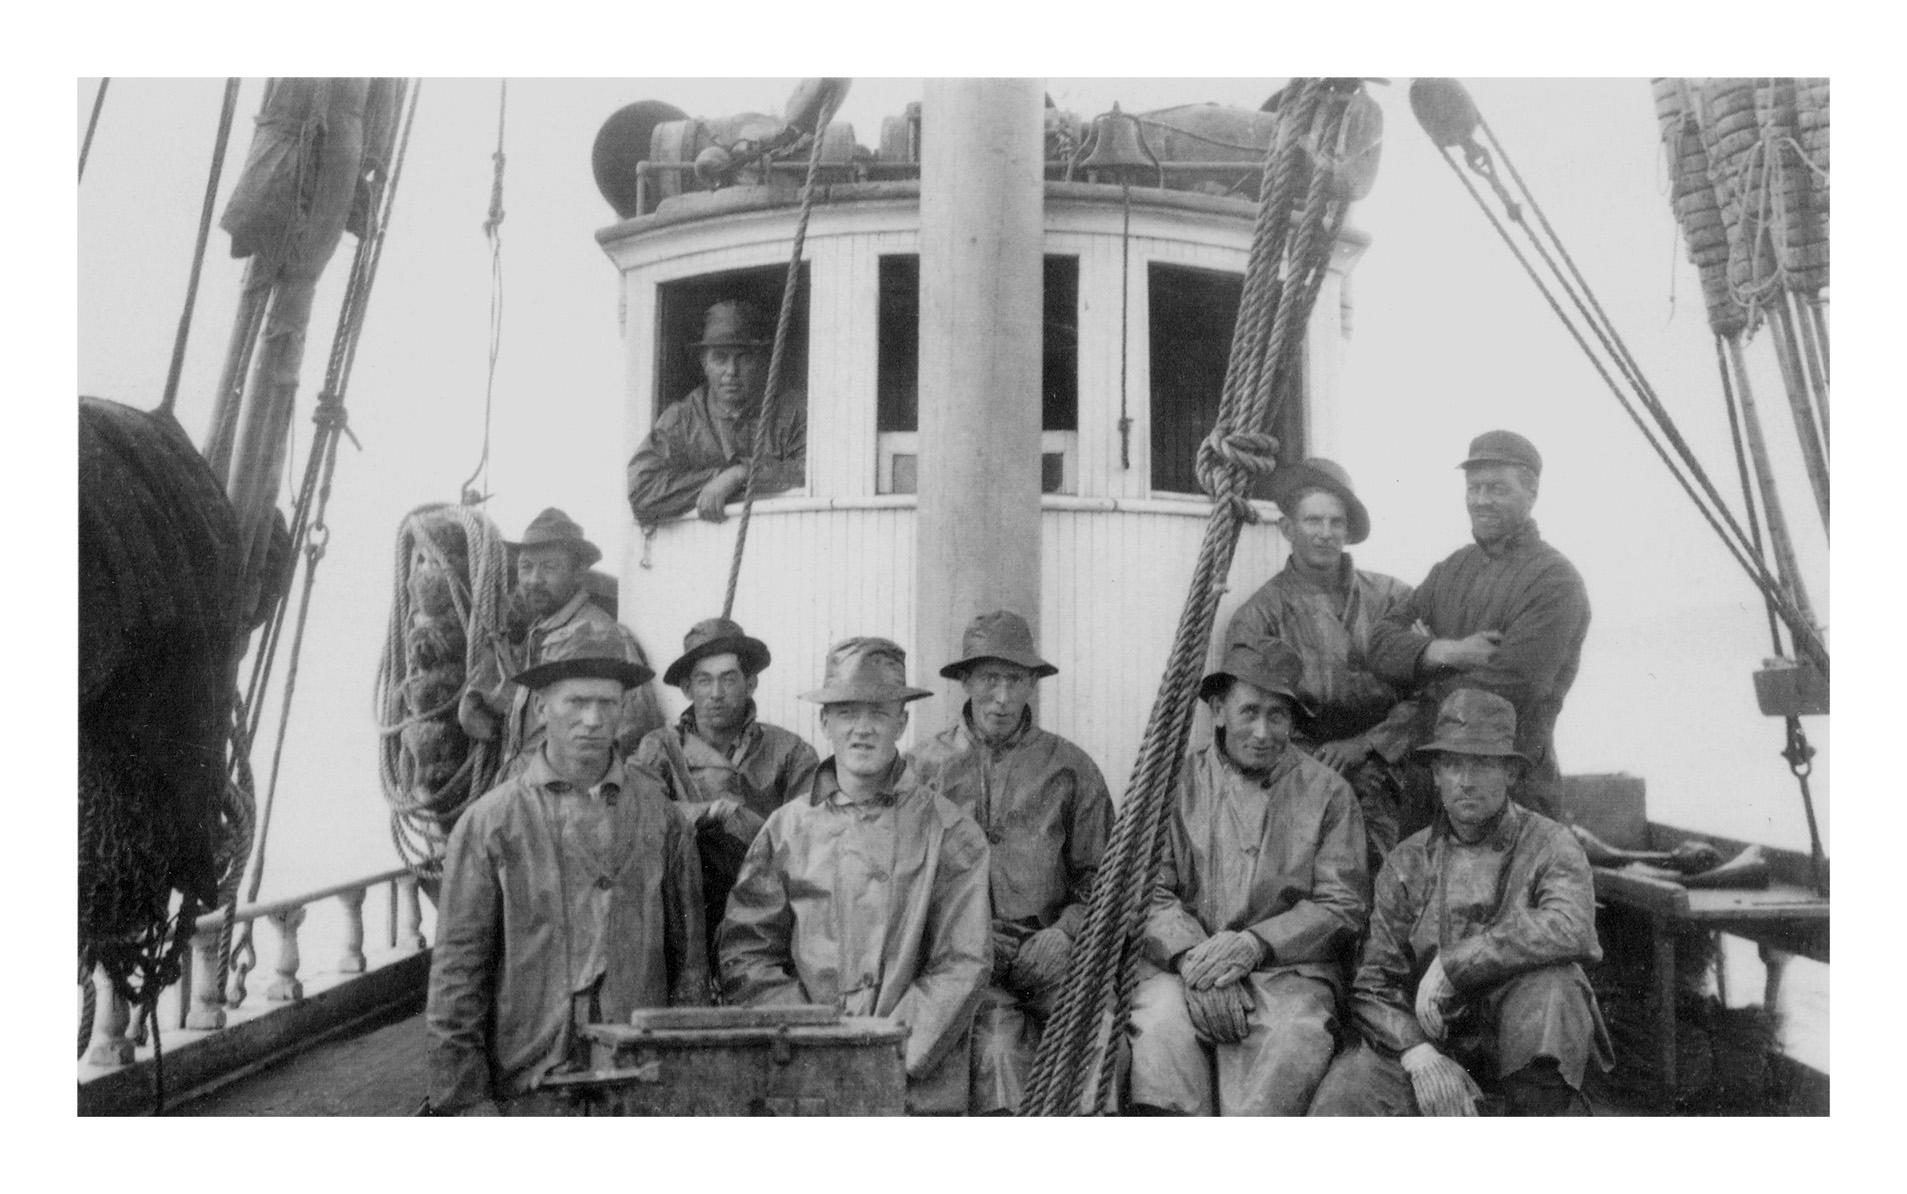 crew-on-deck-in-raingear-front-of-wheelhouse_bw_4x6-300dpi.jpg